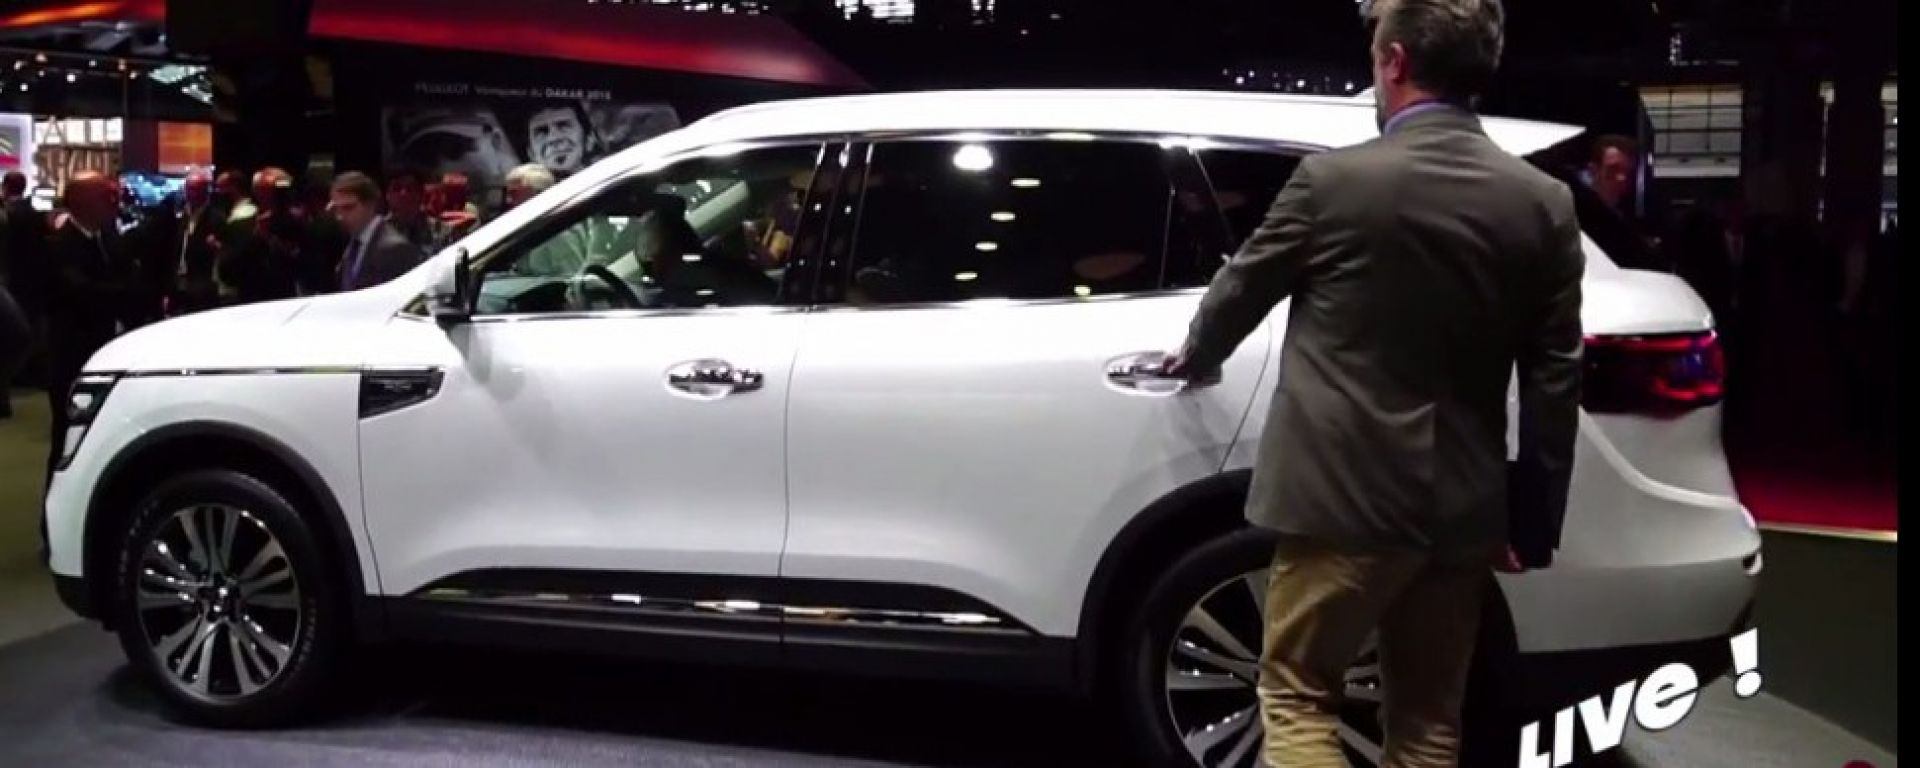 Live Parigi 2016: Renault Koleos, Megane e Trezor Concept in video